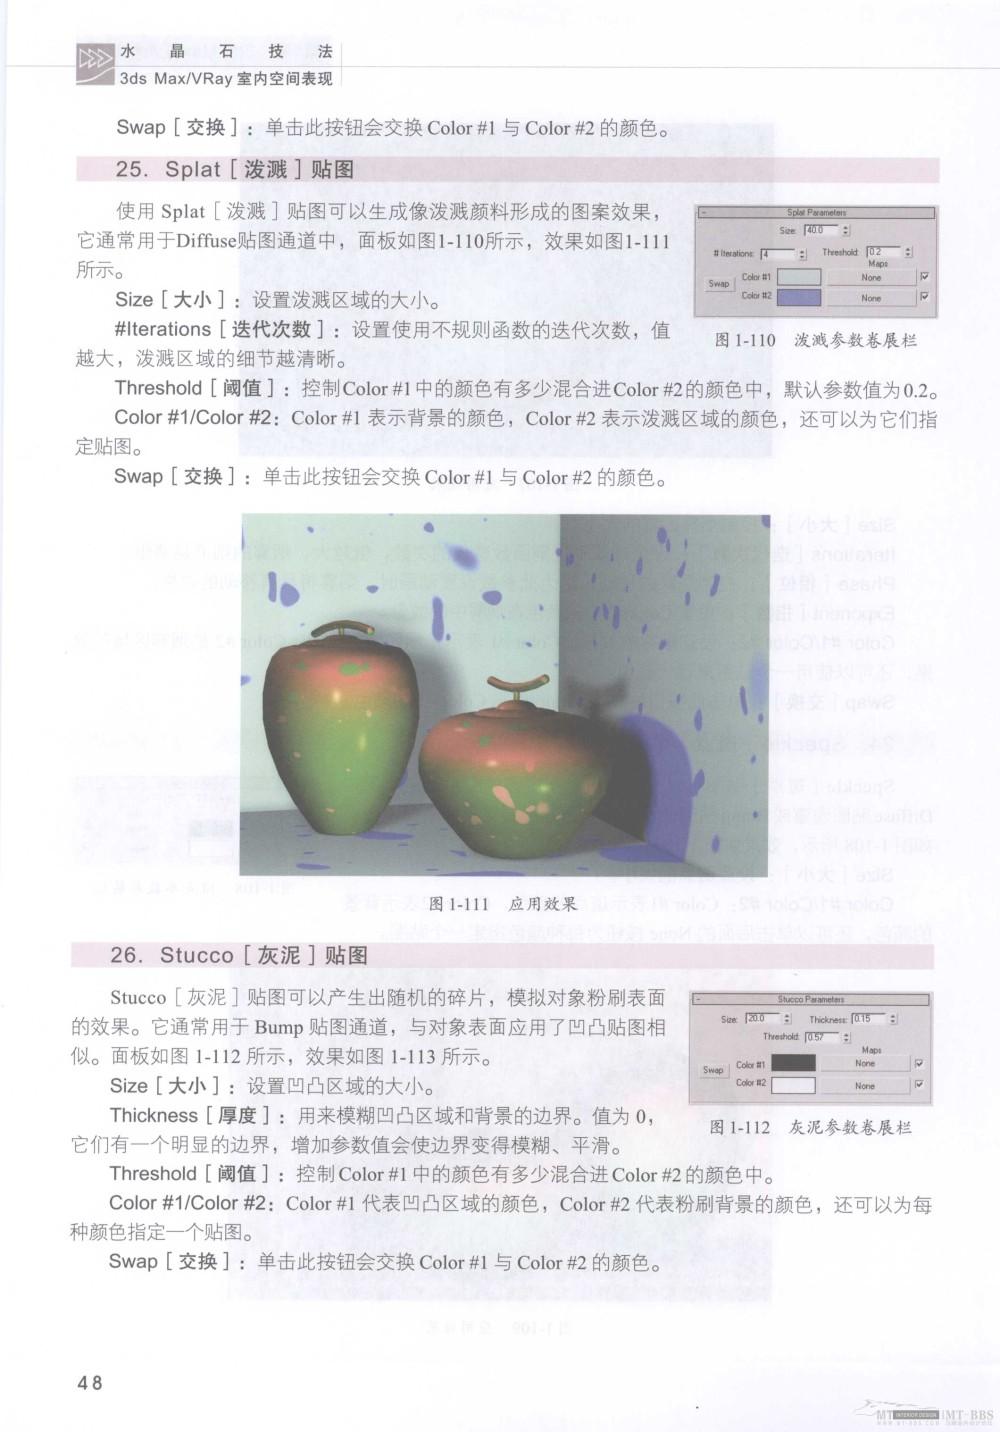 水晶石技法-3ds_Max&VRay室内空间表现_水晶石技法-3ds_Max&VRay室内空间表现_页面_054.jpg